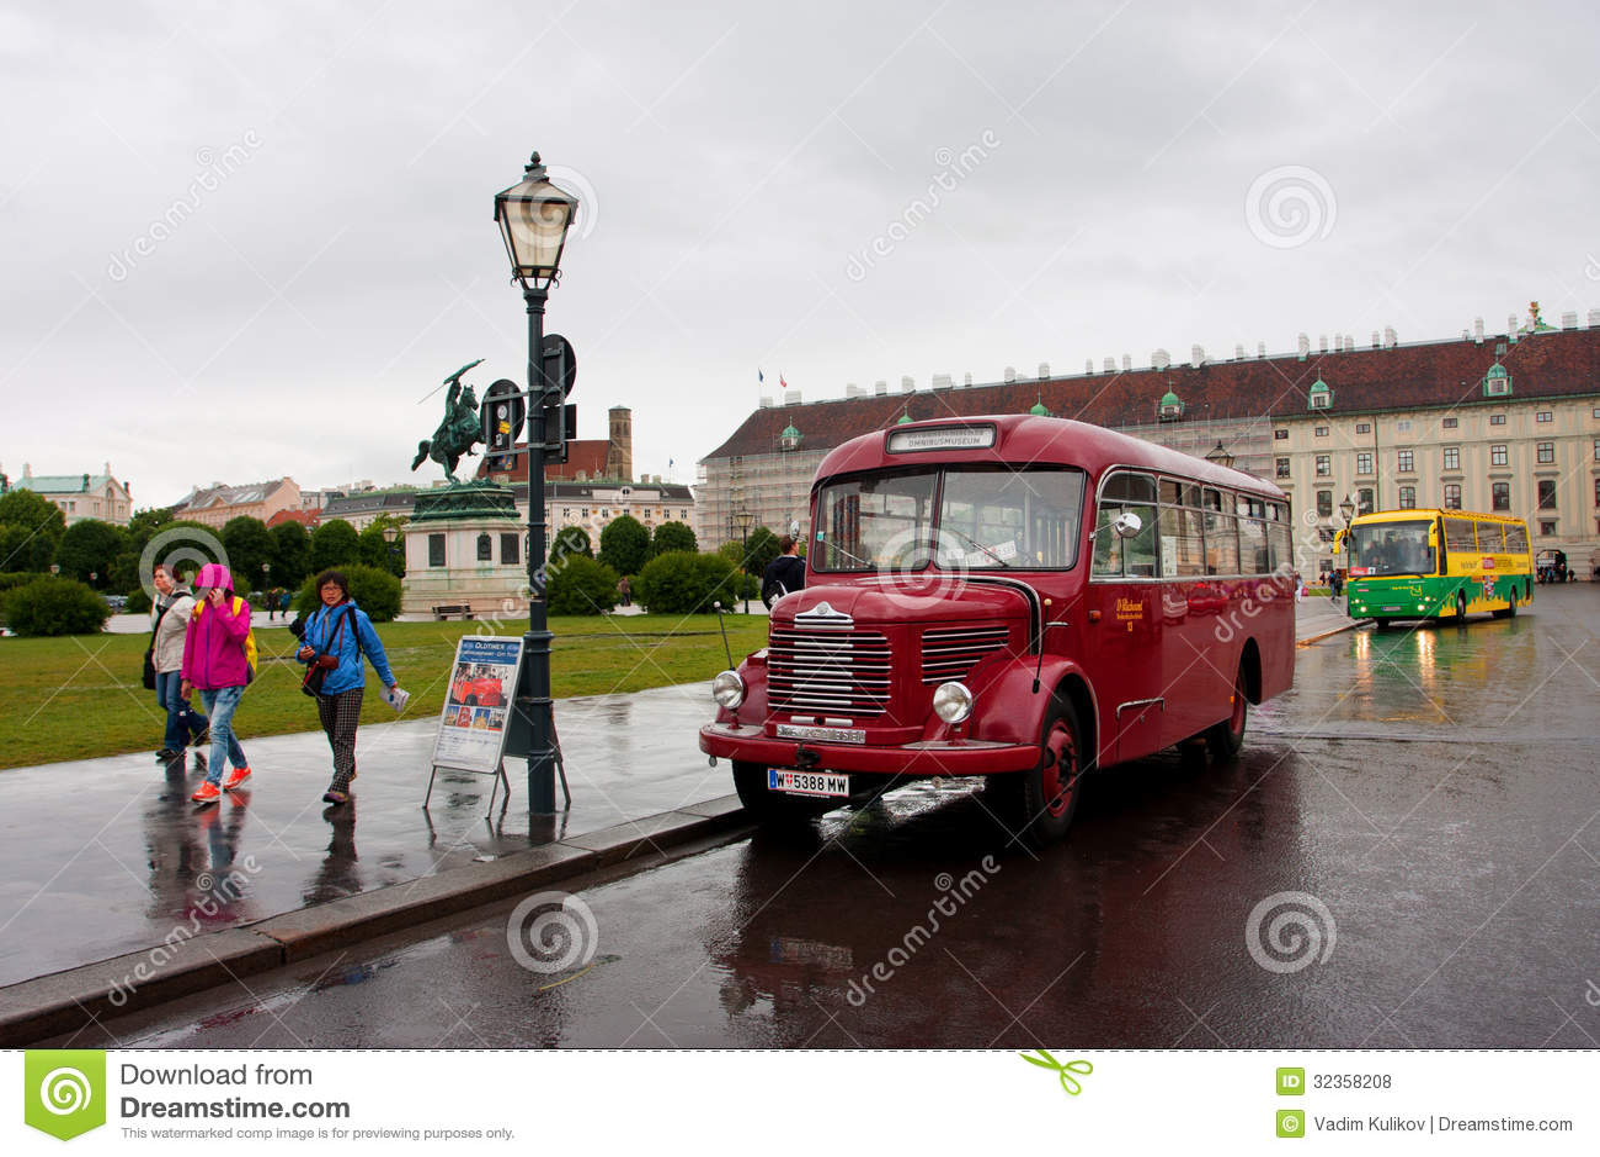 People Walk On Rainy Street Past The Antique Touristic Bus